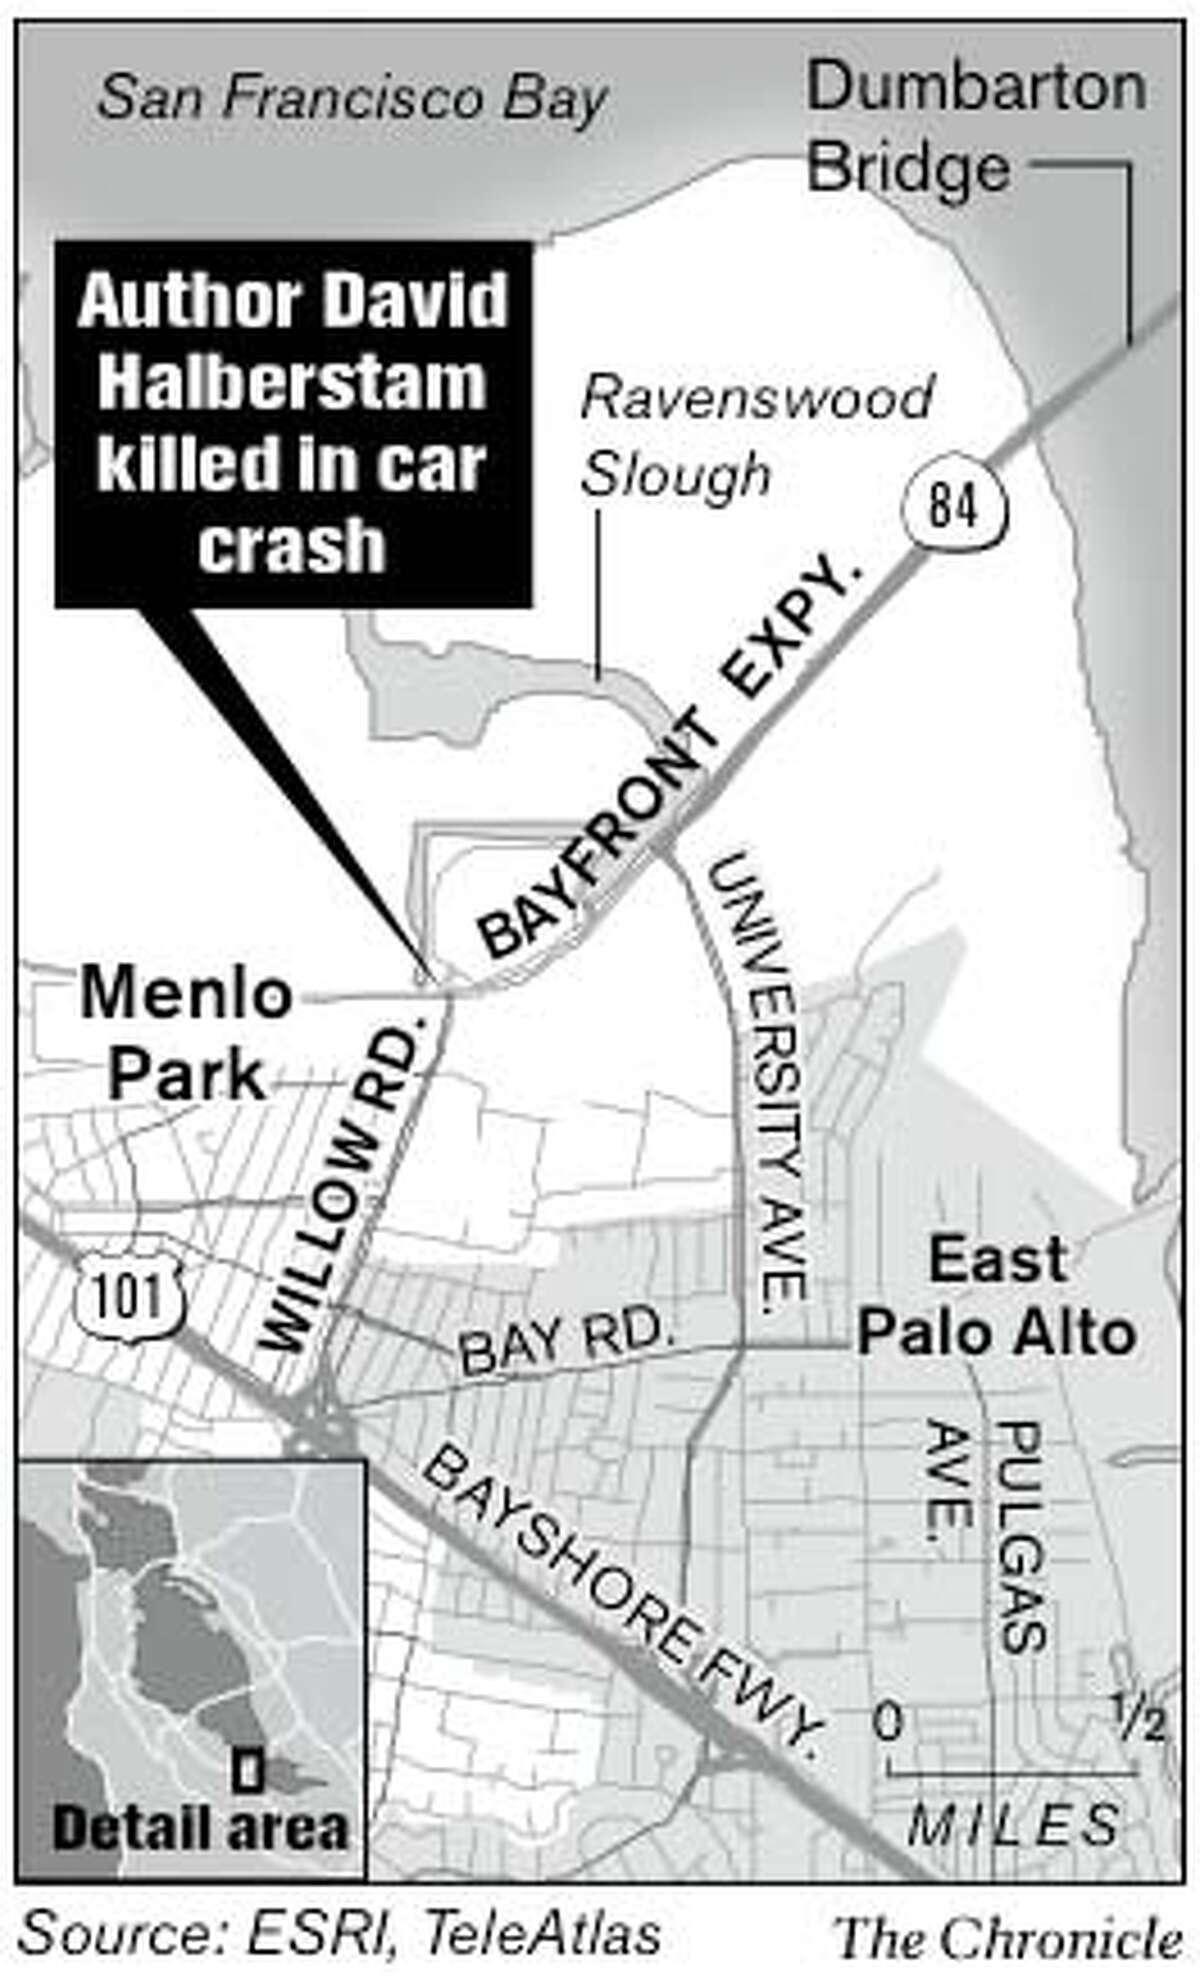 Author David Halberstam Killed in Car Crash. Chronicle Graphic